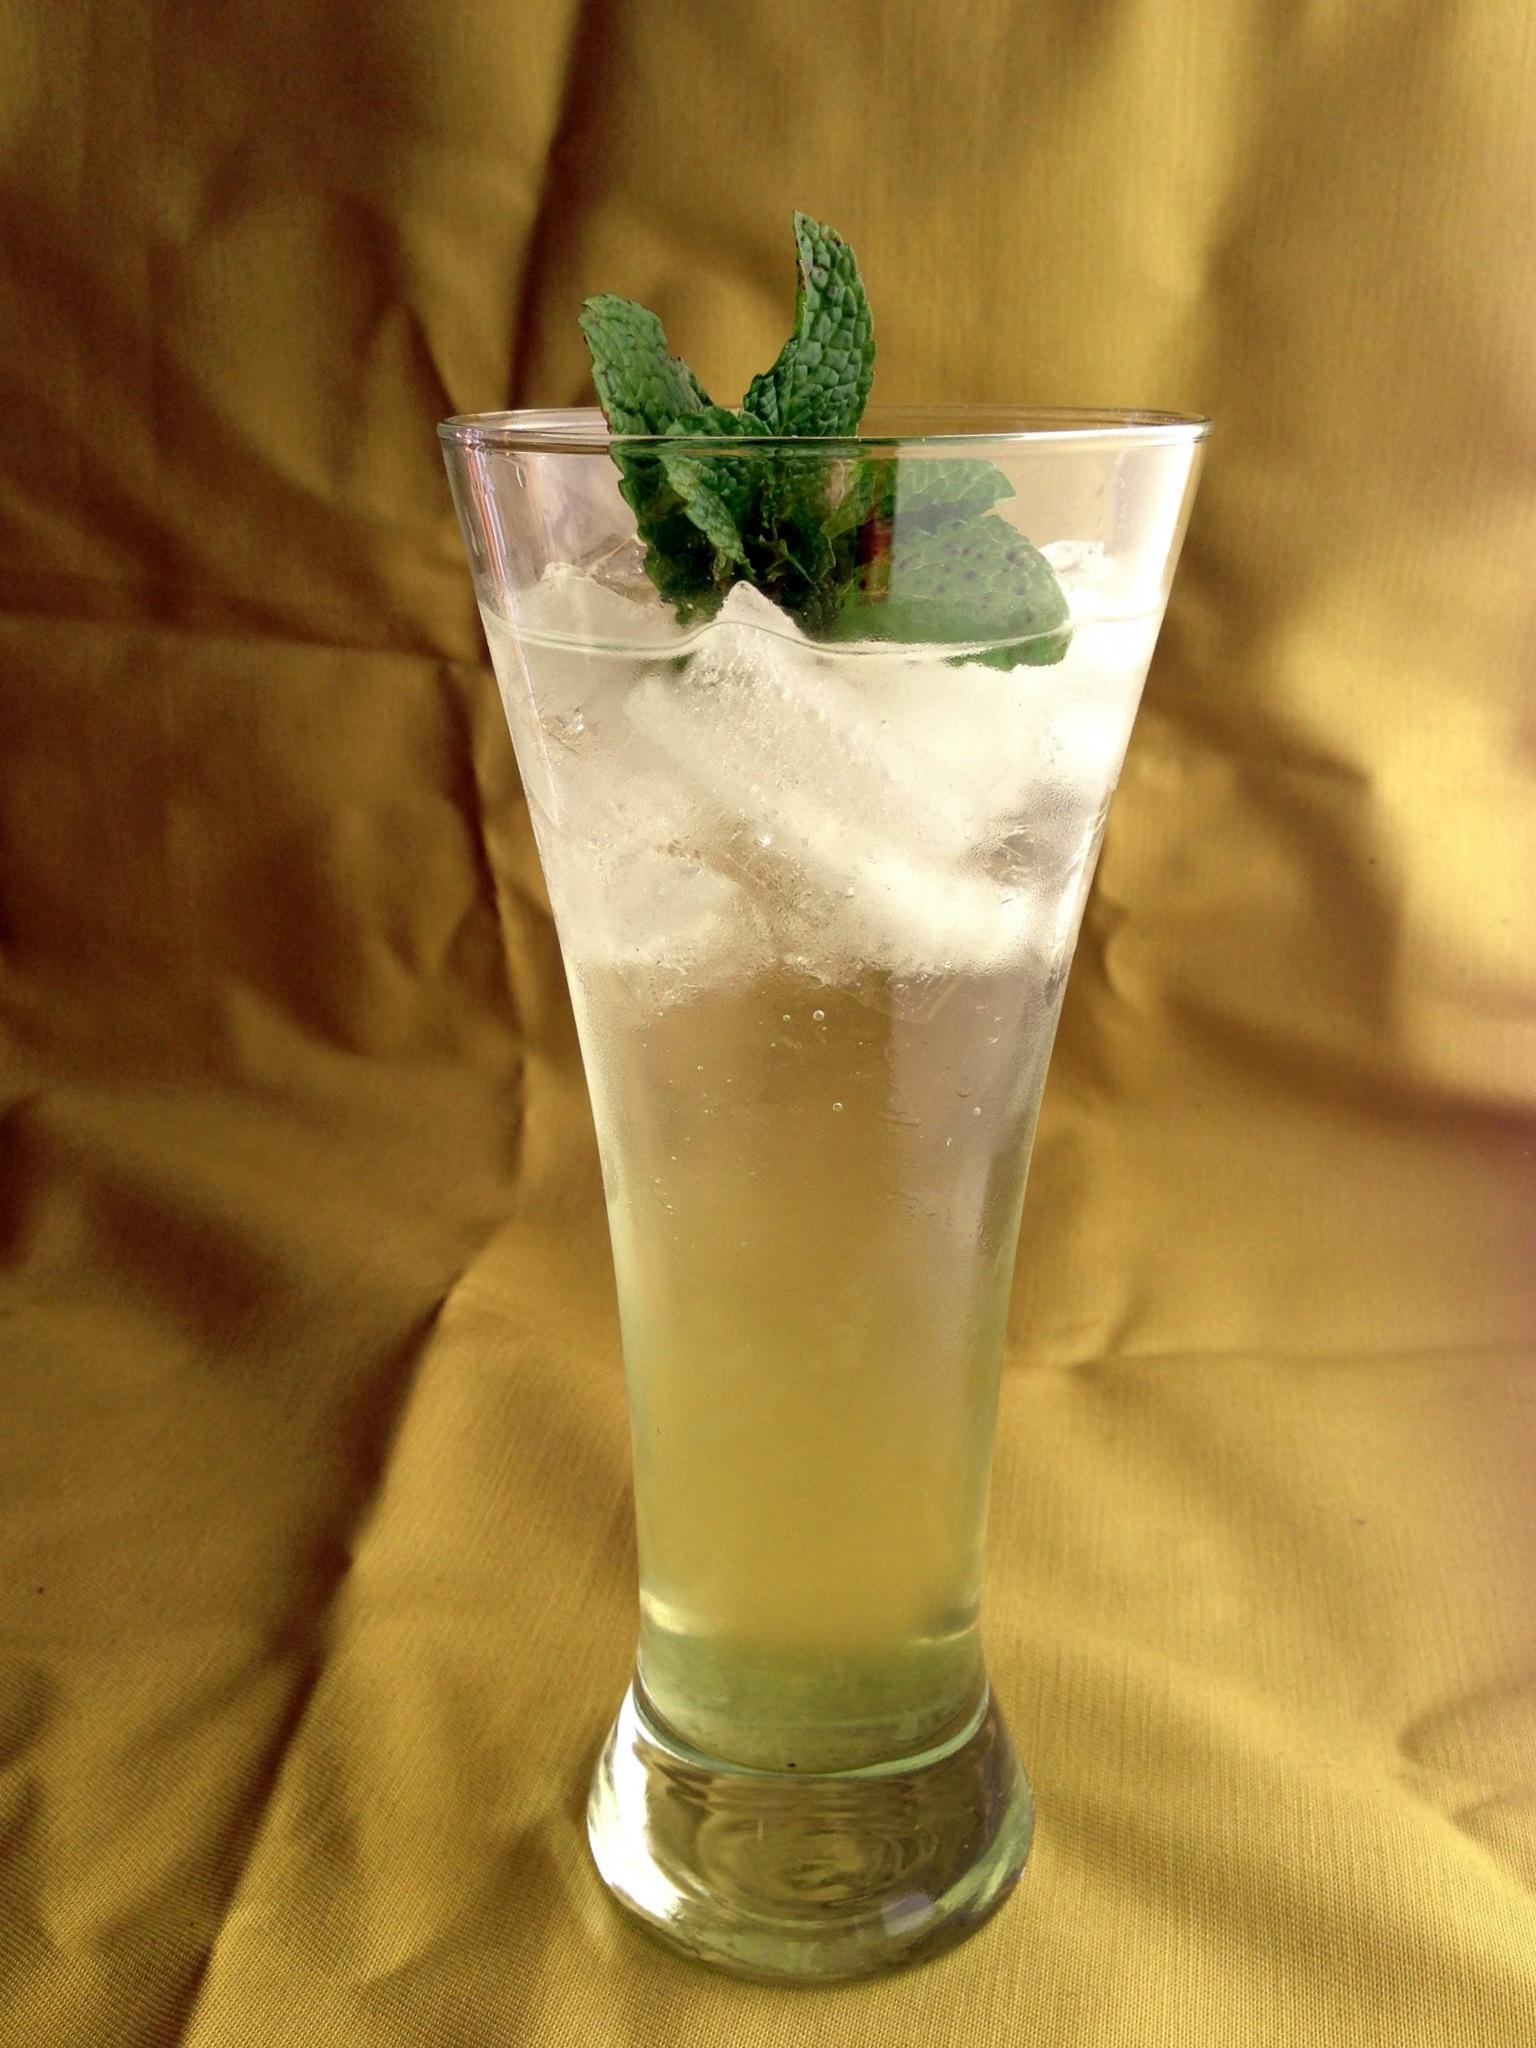 ... sage leaves ½ small lime lemongrass soda lemongrass lime leaf soda